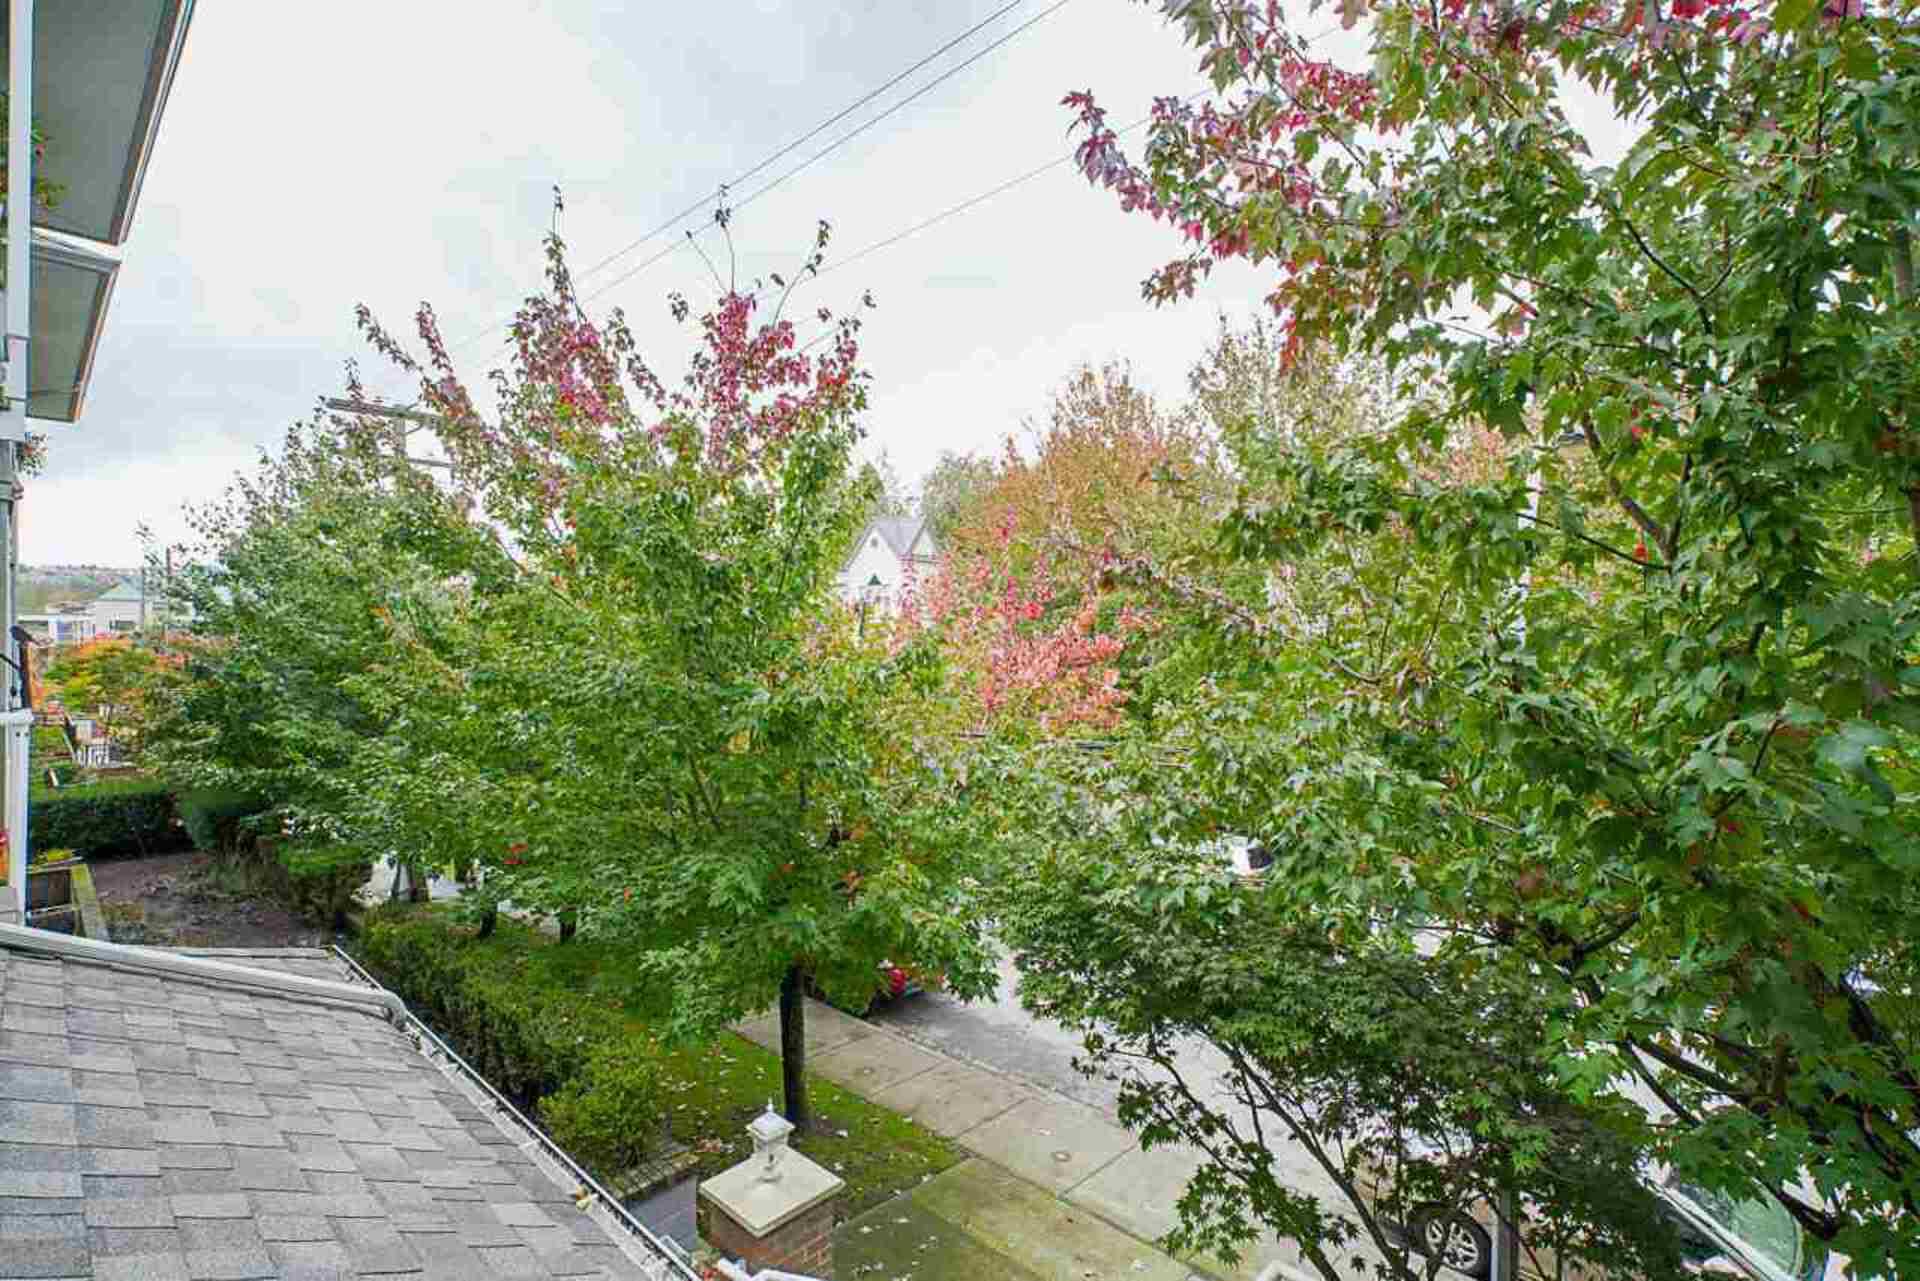 2268-welcher-avenue-central-pt-coquitlam-port-coquitlam-21 of 201 - 2268 Welcher Avenue, Central Pt Coquitlam, Port Coquitlam